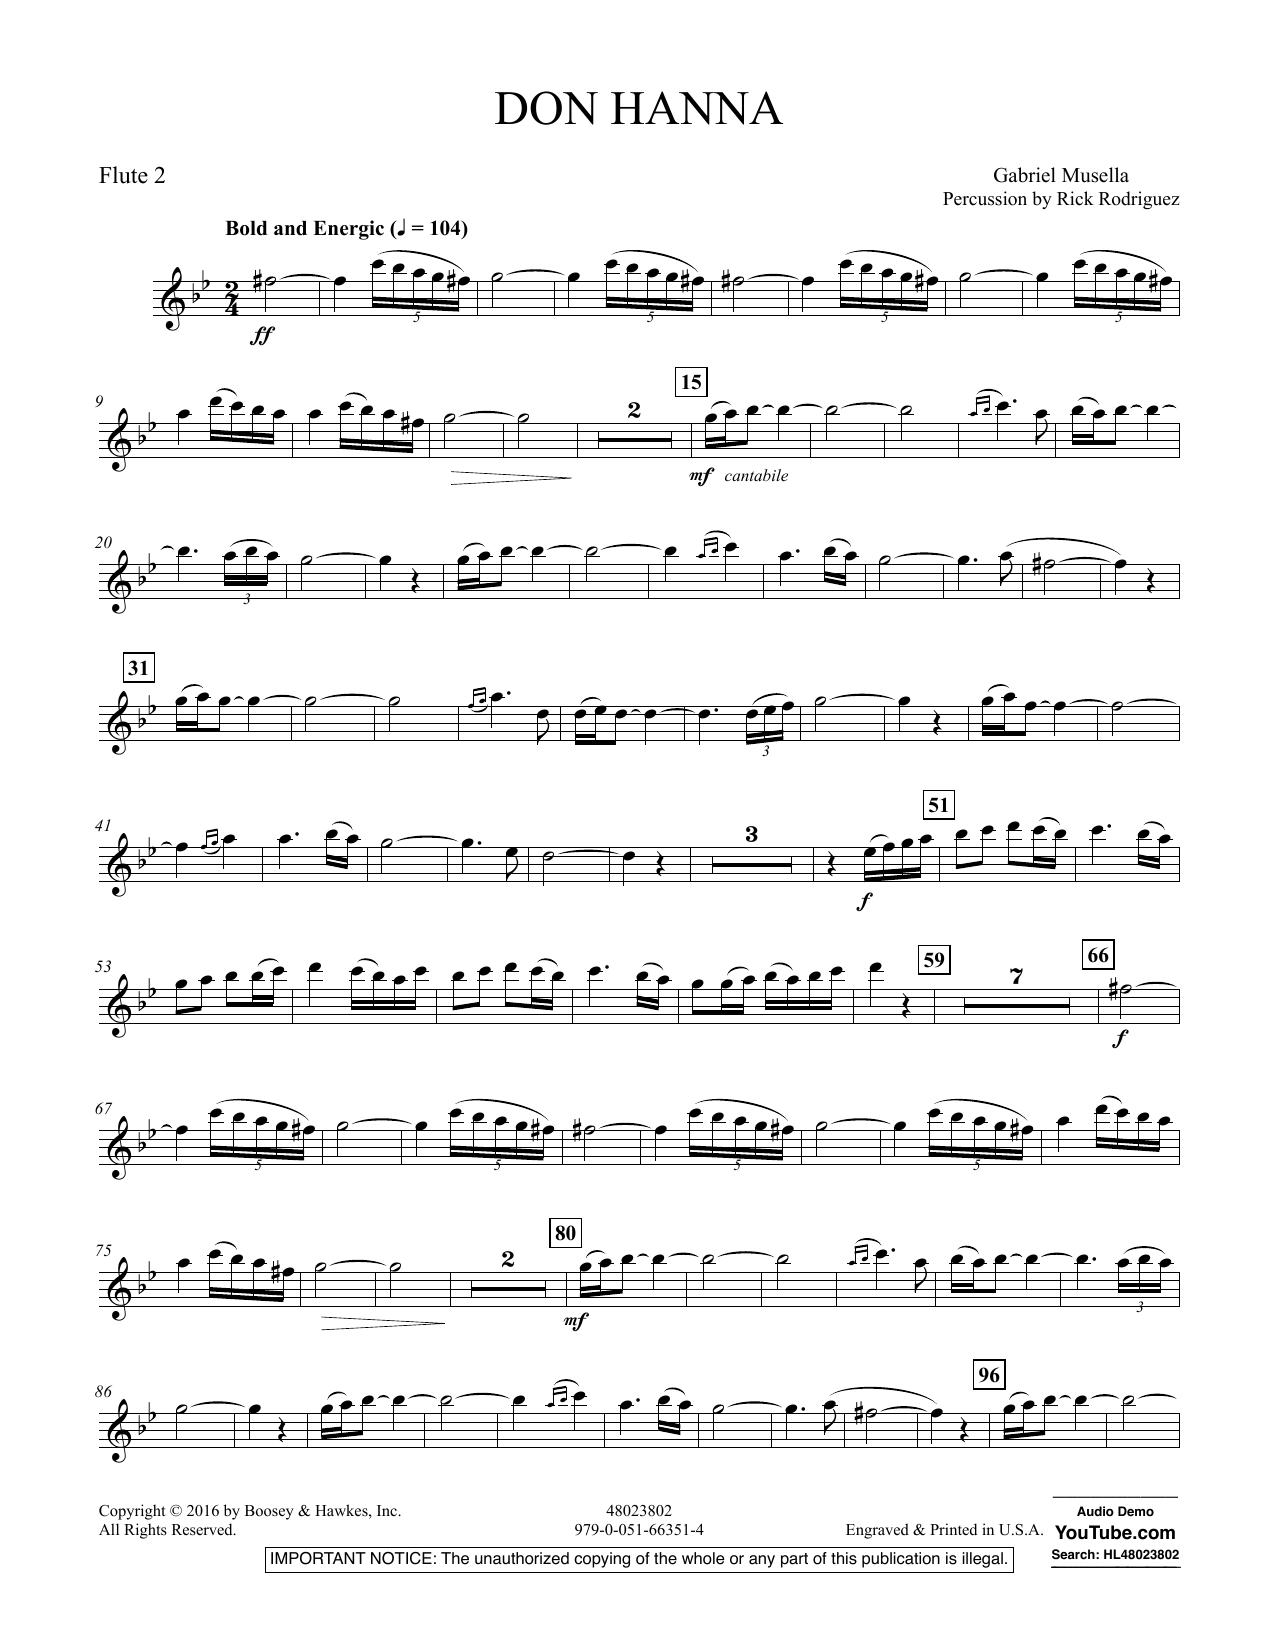 Don Hanna - Flute 2